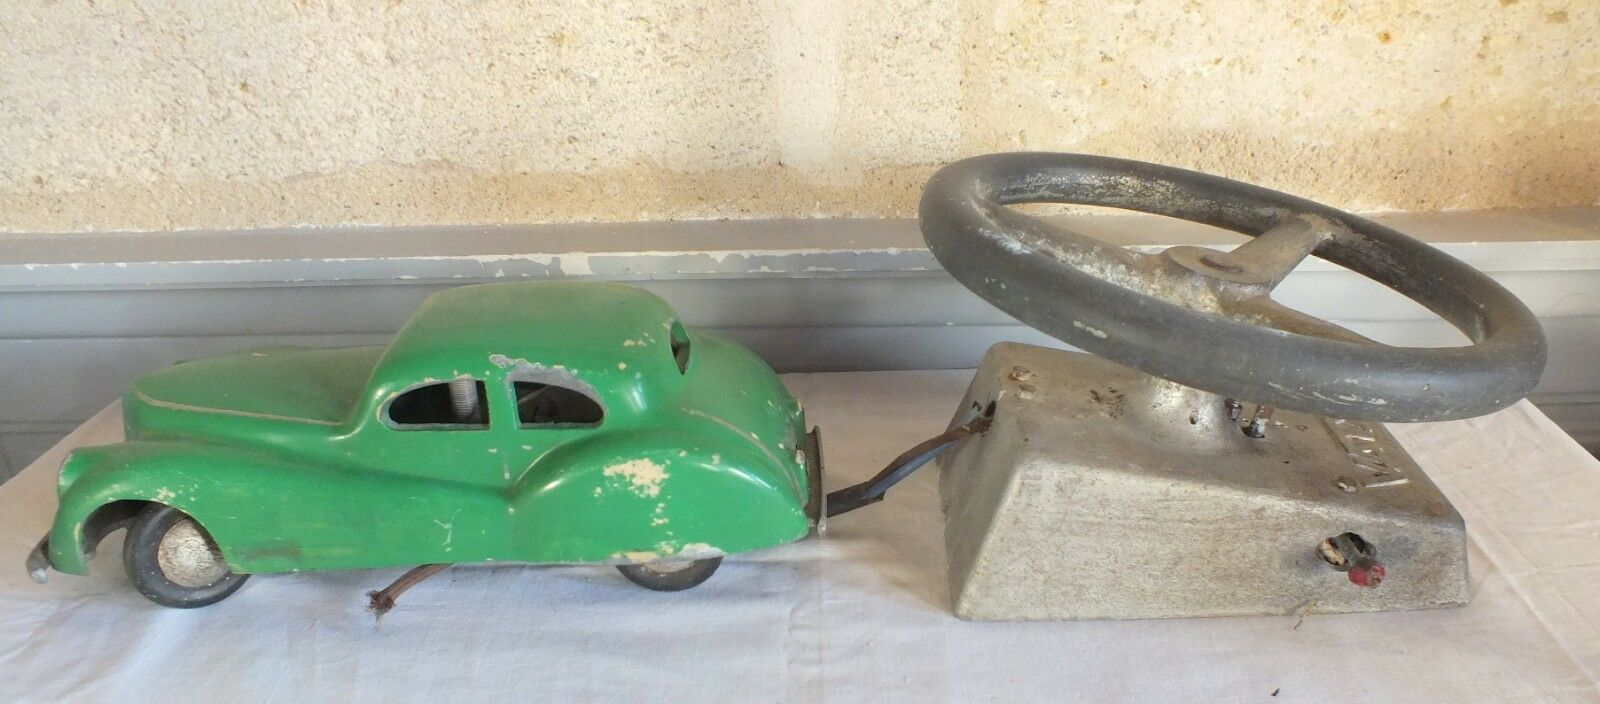 Vaty game forain car aluminium vintage - + steering wheel (no.5)